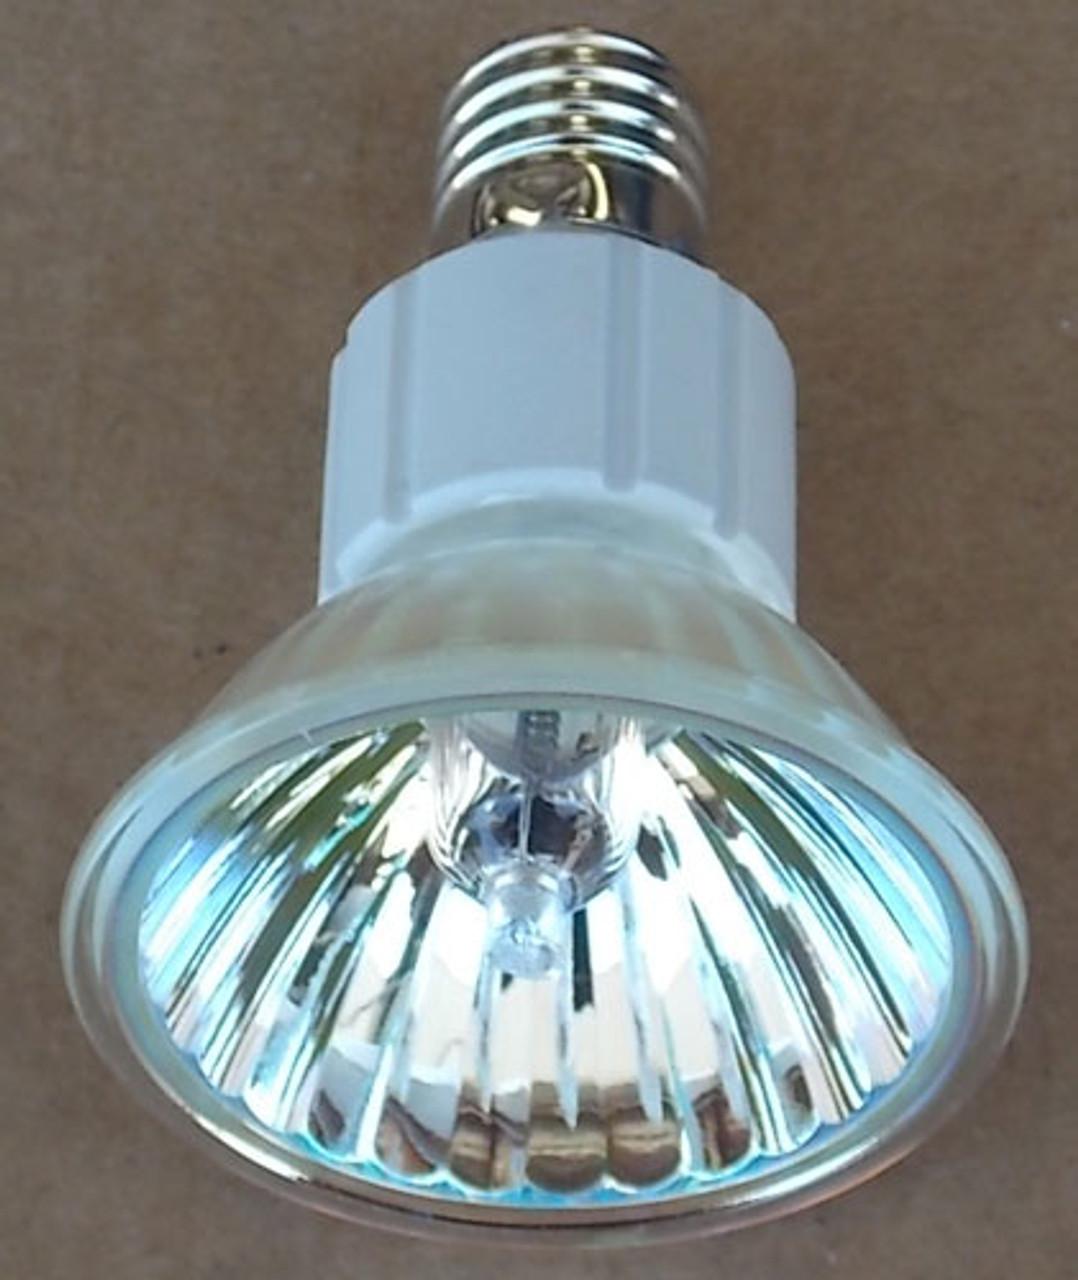 Ushio #1001016 100W 120V MR16 E17 Halogen JDR Series Halogen Lamp - New